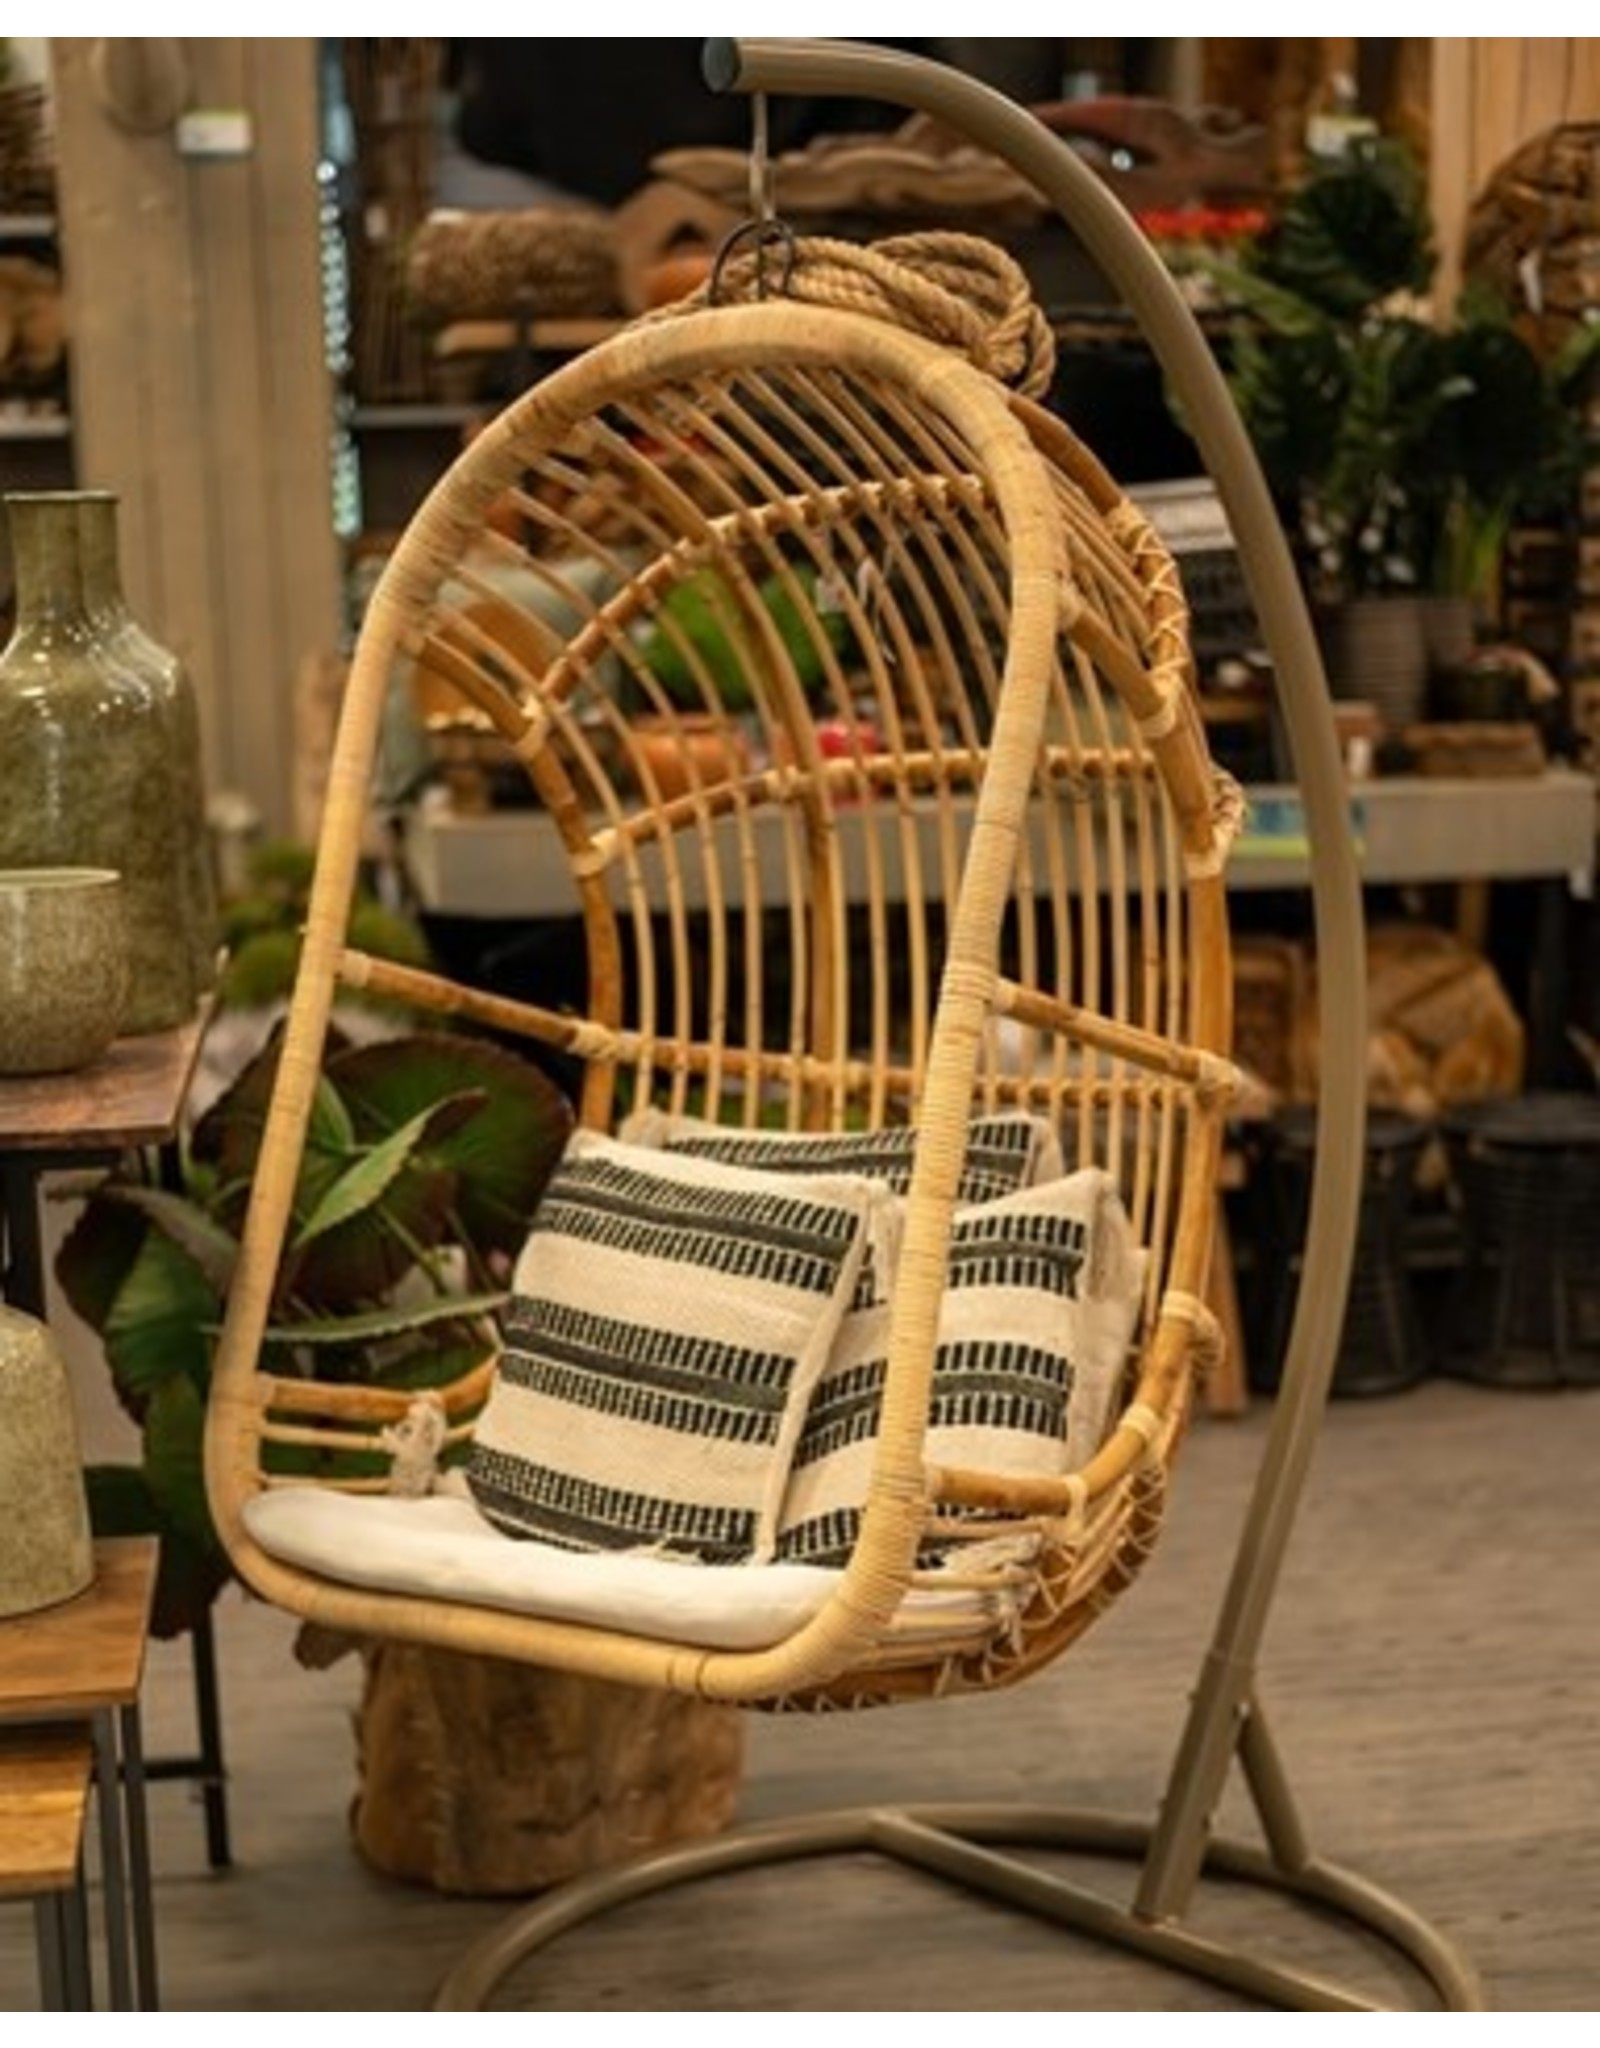 Van der Leeden Mandwerk Egg Chair Rattan Blond 77X69H120cm - Incl Cushion